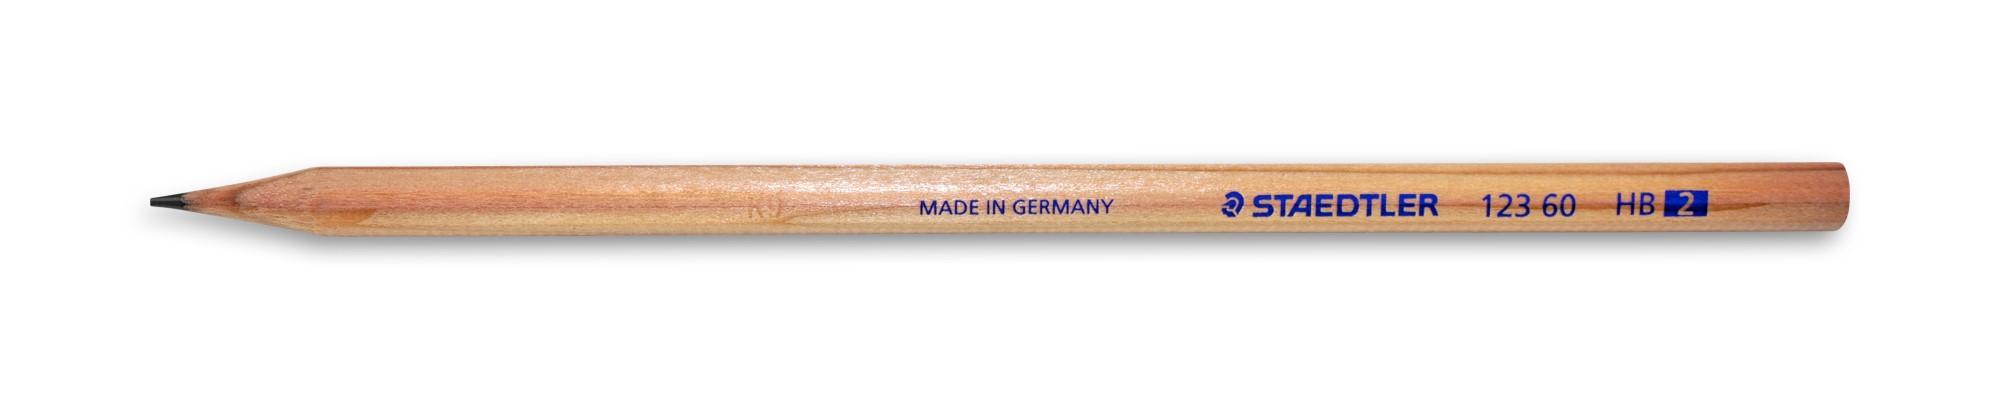 Staedtler  Holzbleistift